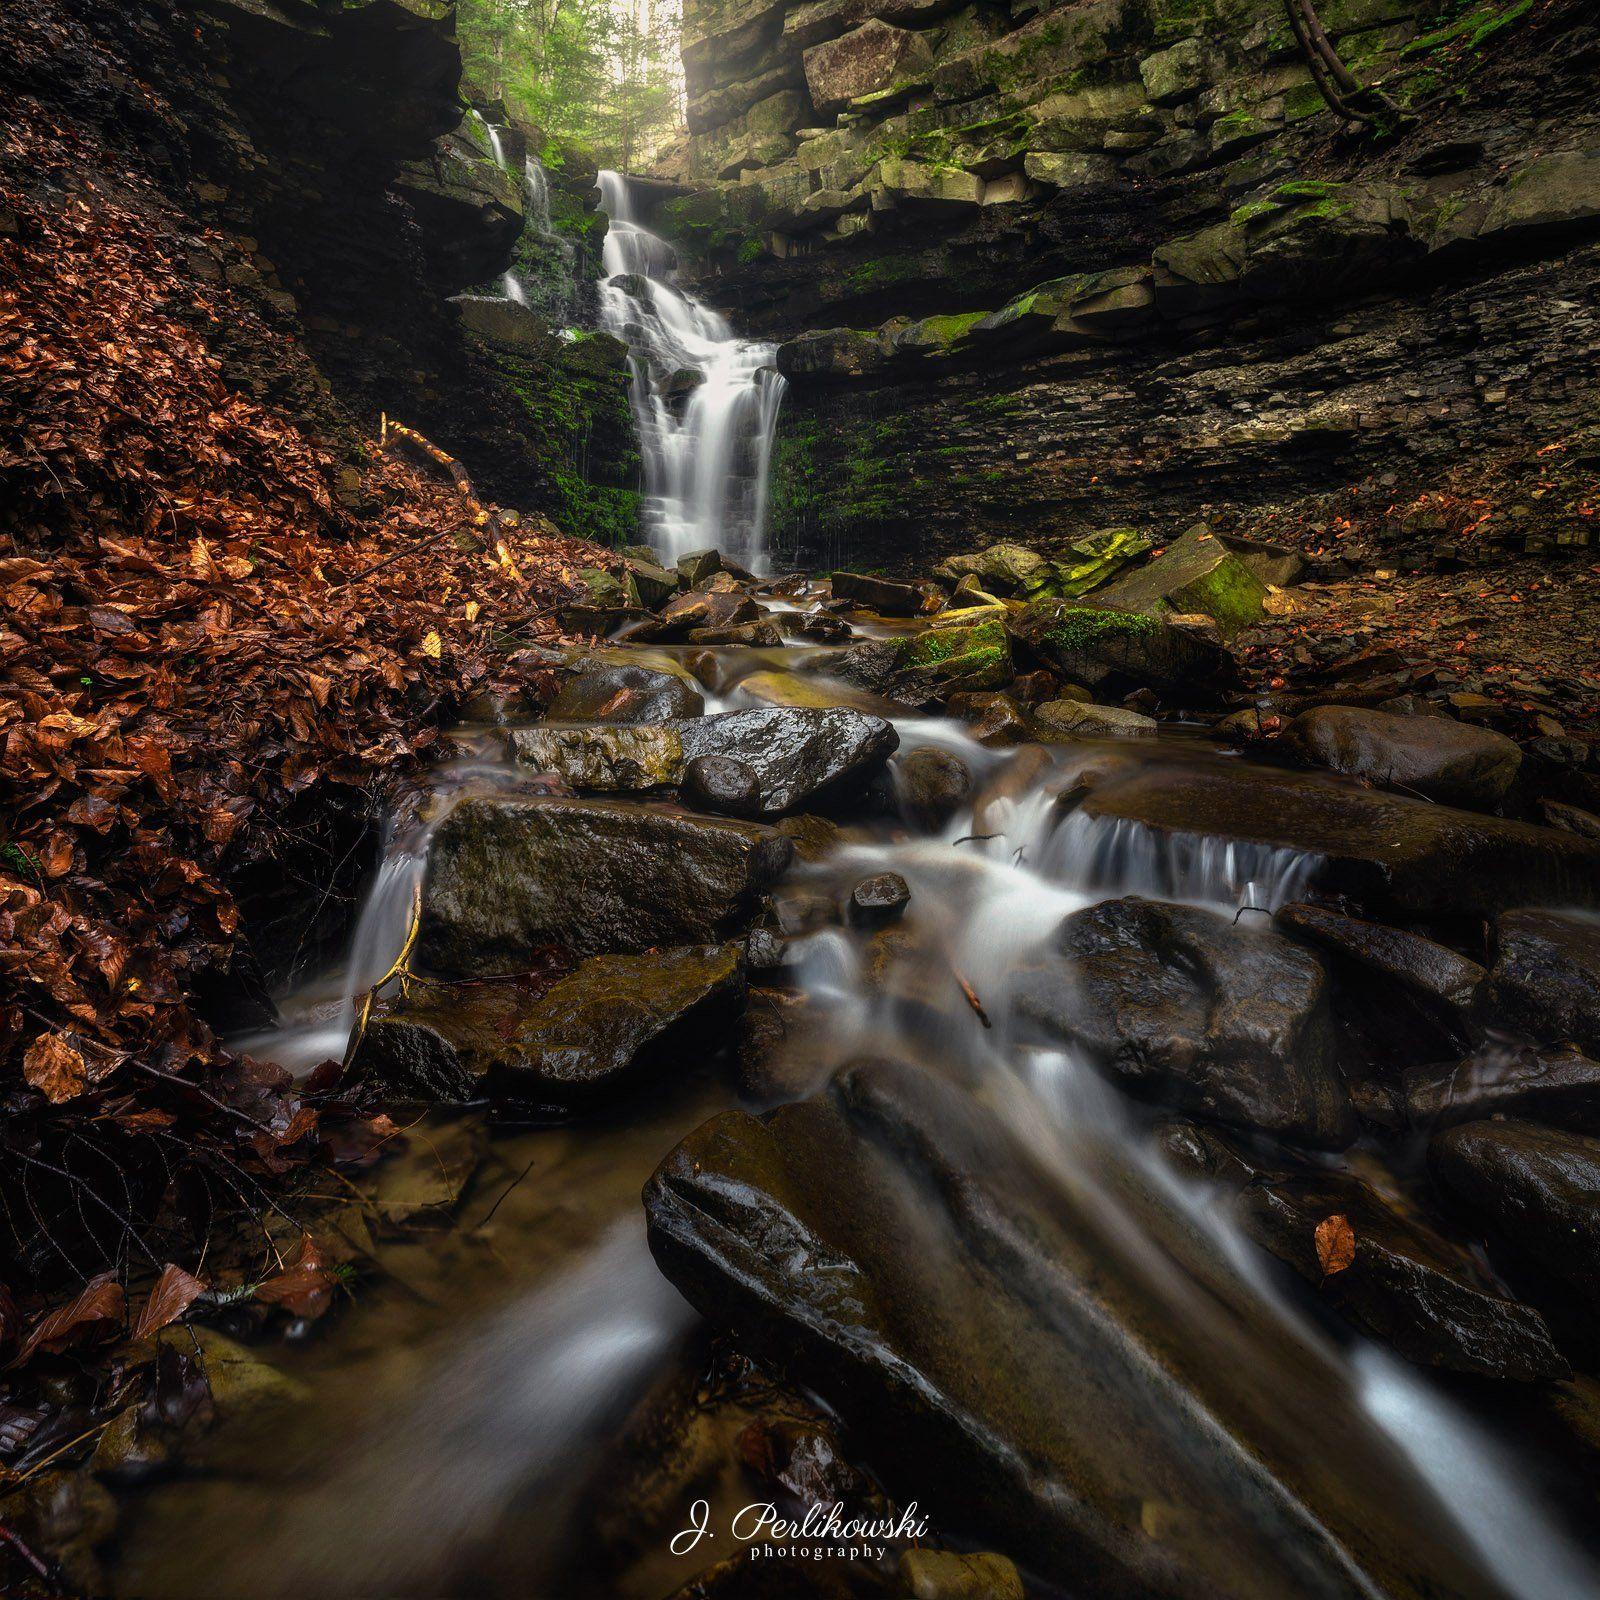 waterfall, forest, moody, long exposure, rainy, river, landscape, Perlikowski Jakub